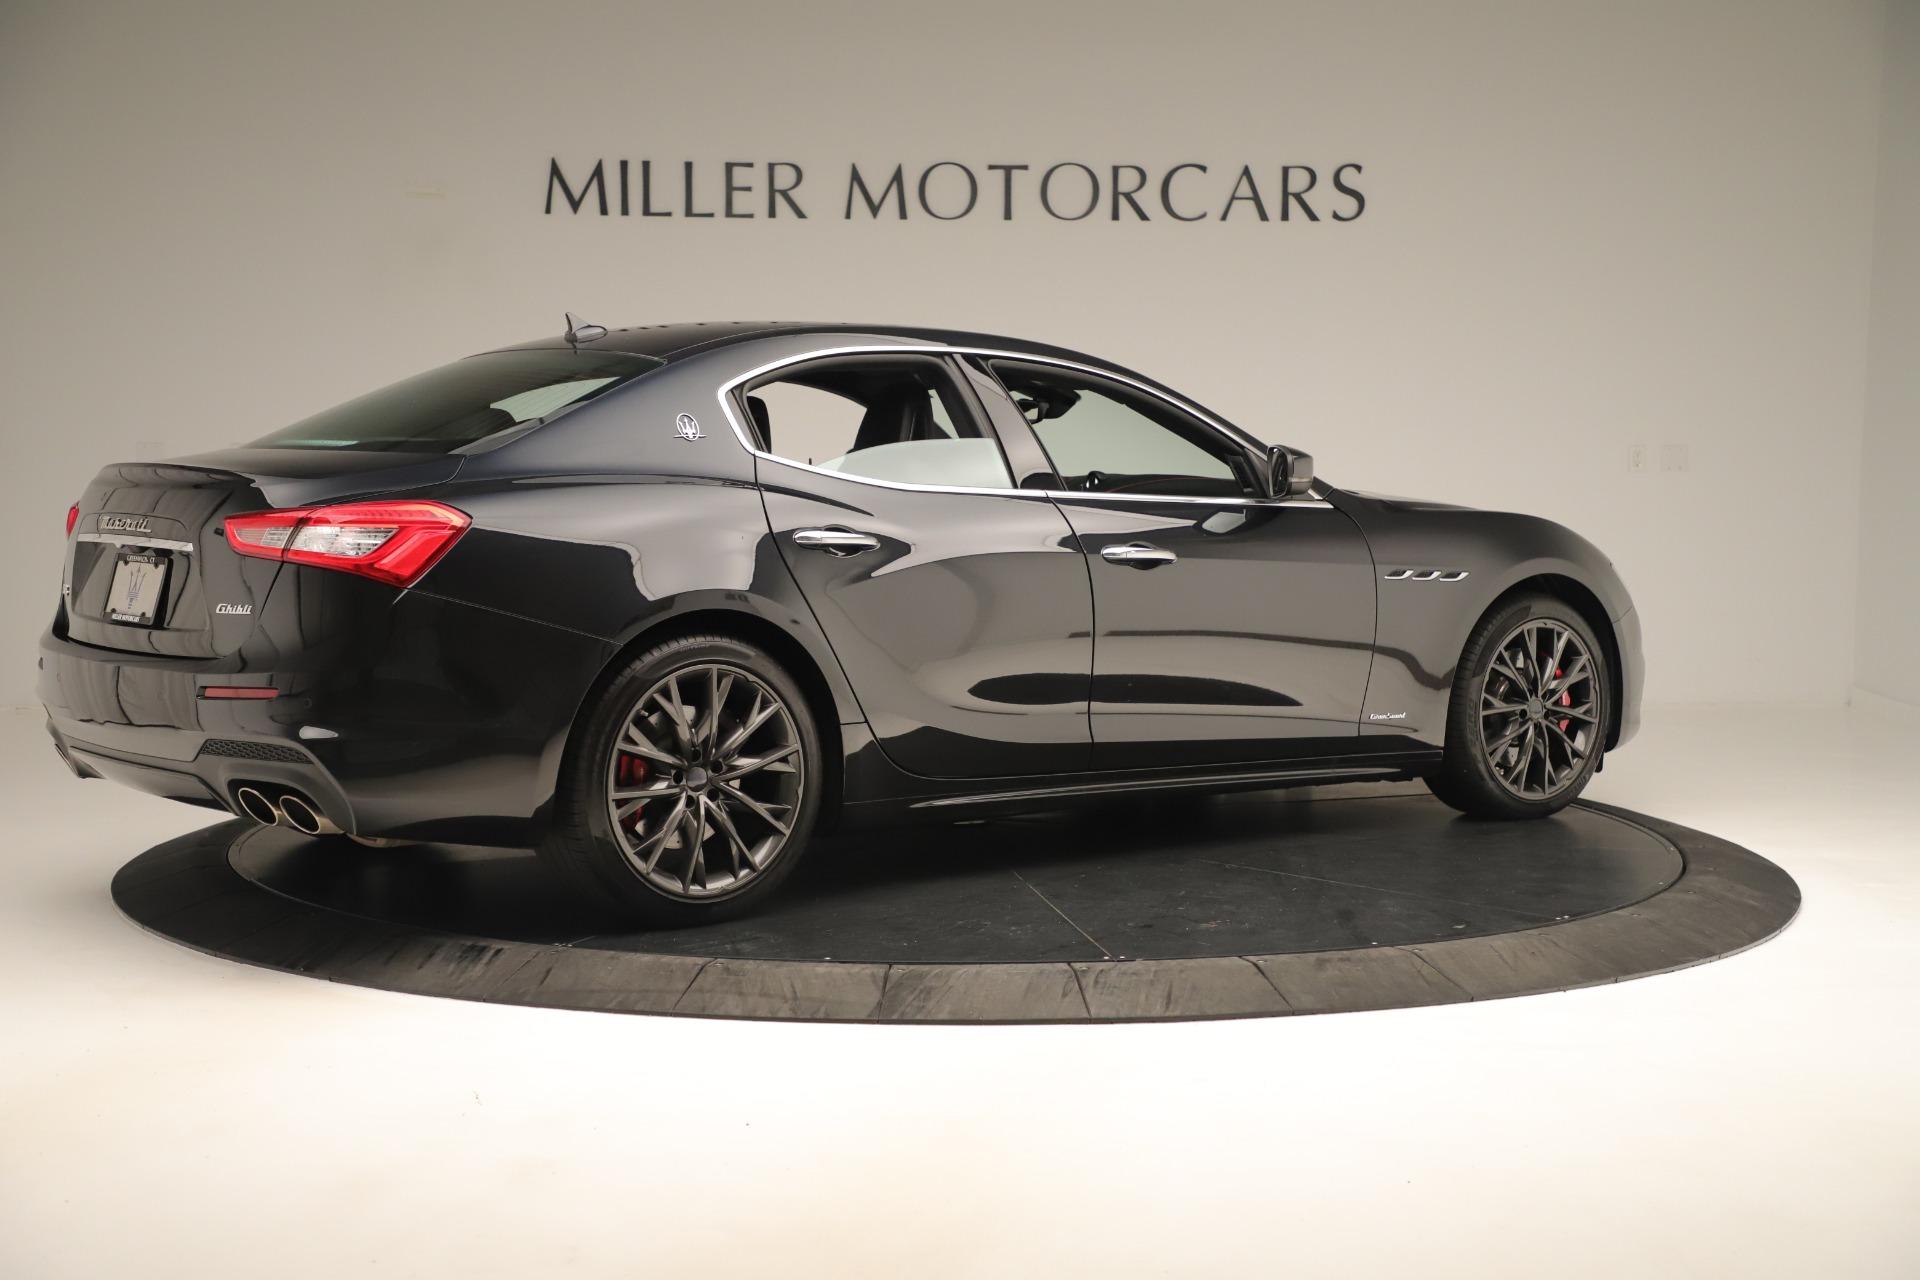 New 2019 Maserati Ghibli S Q4 GranSport For Sale In Greenwich, CT. Alfa Romeo of Greenwich, M2204 2640_p8